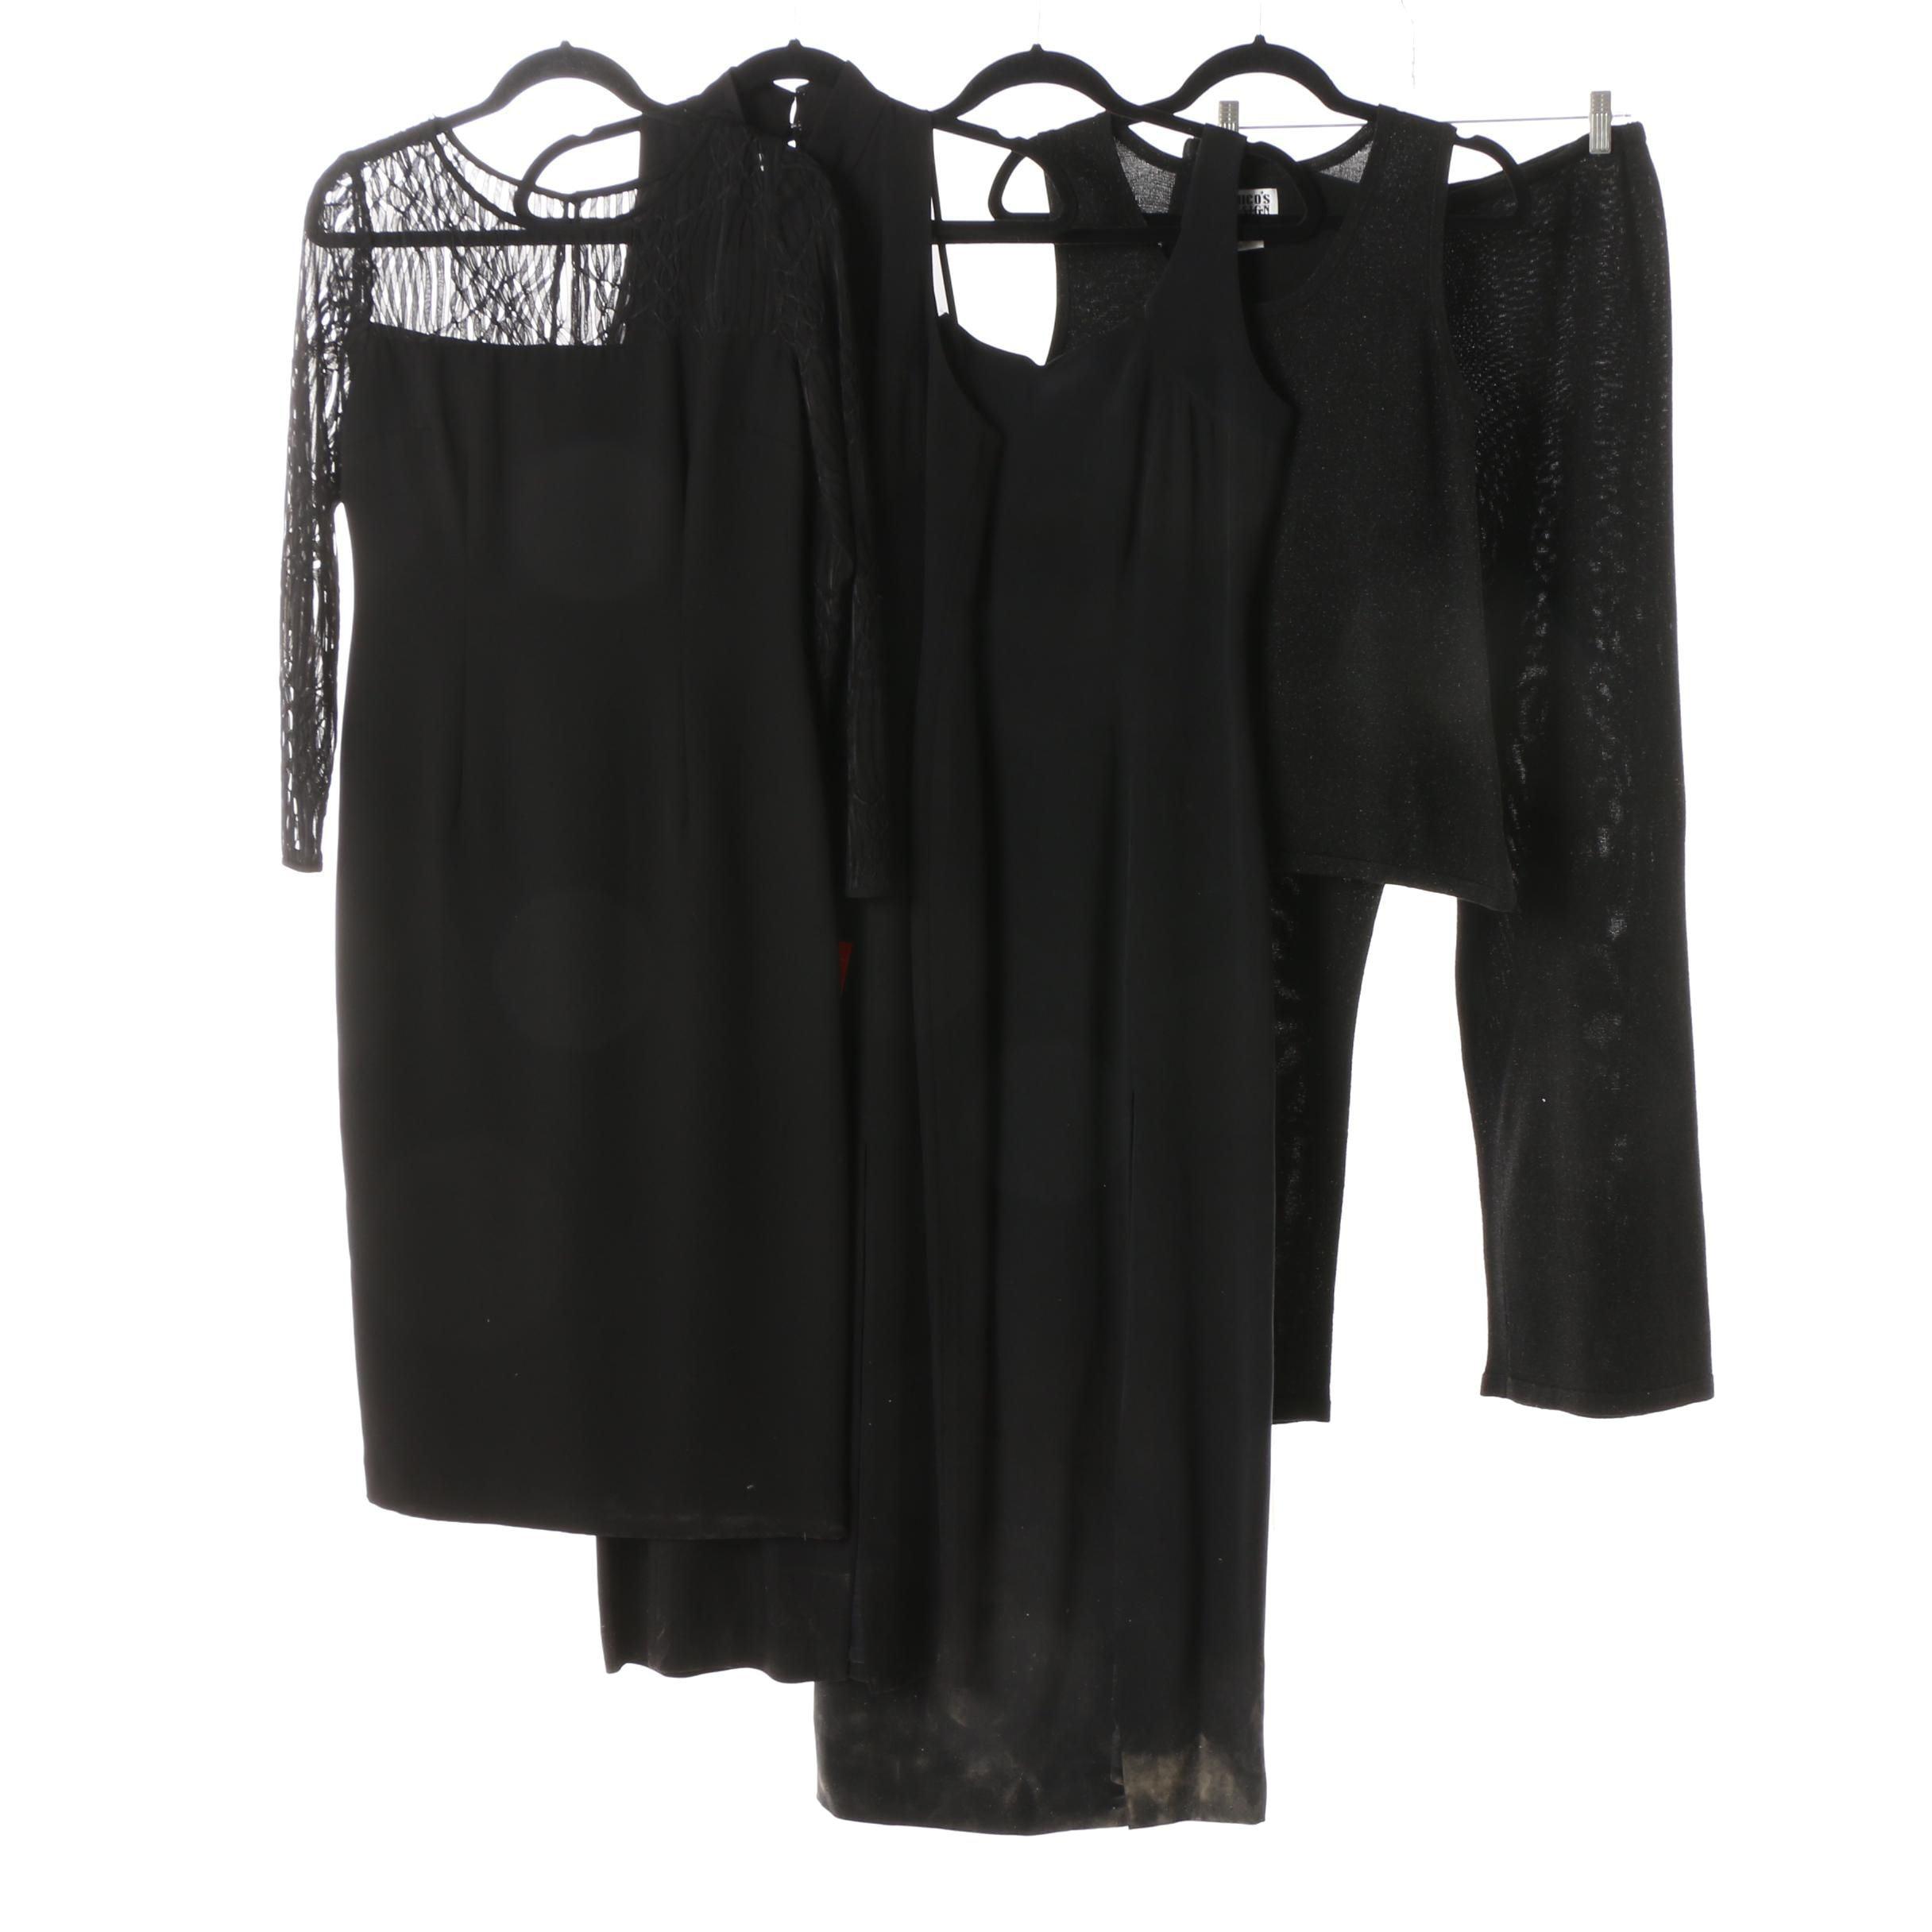 Women's Cocktail Attire in Black